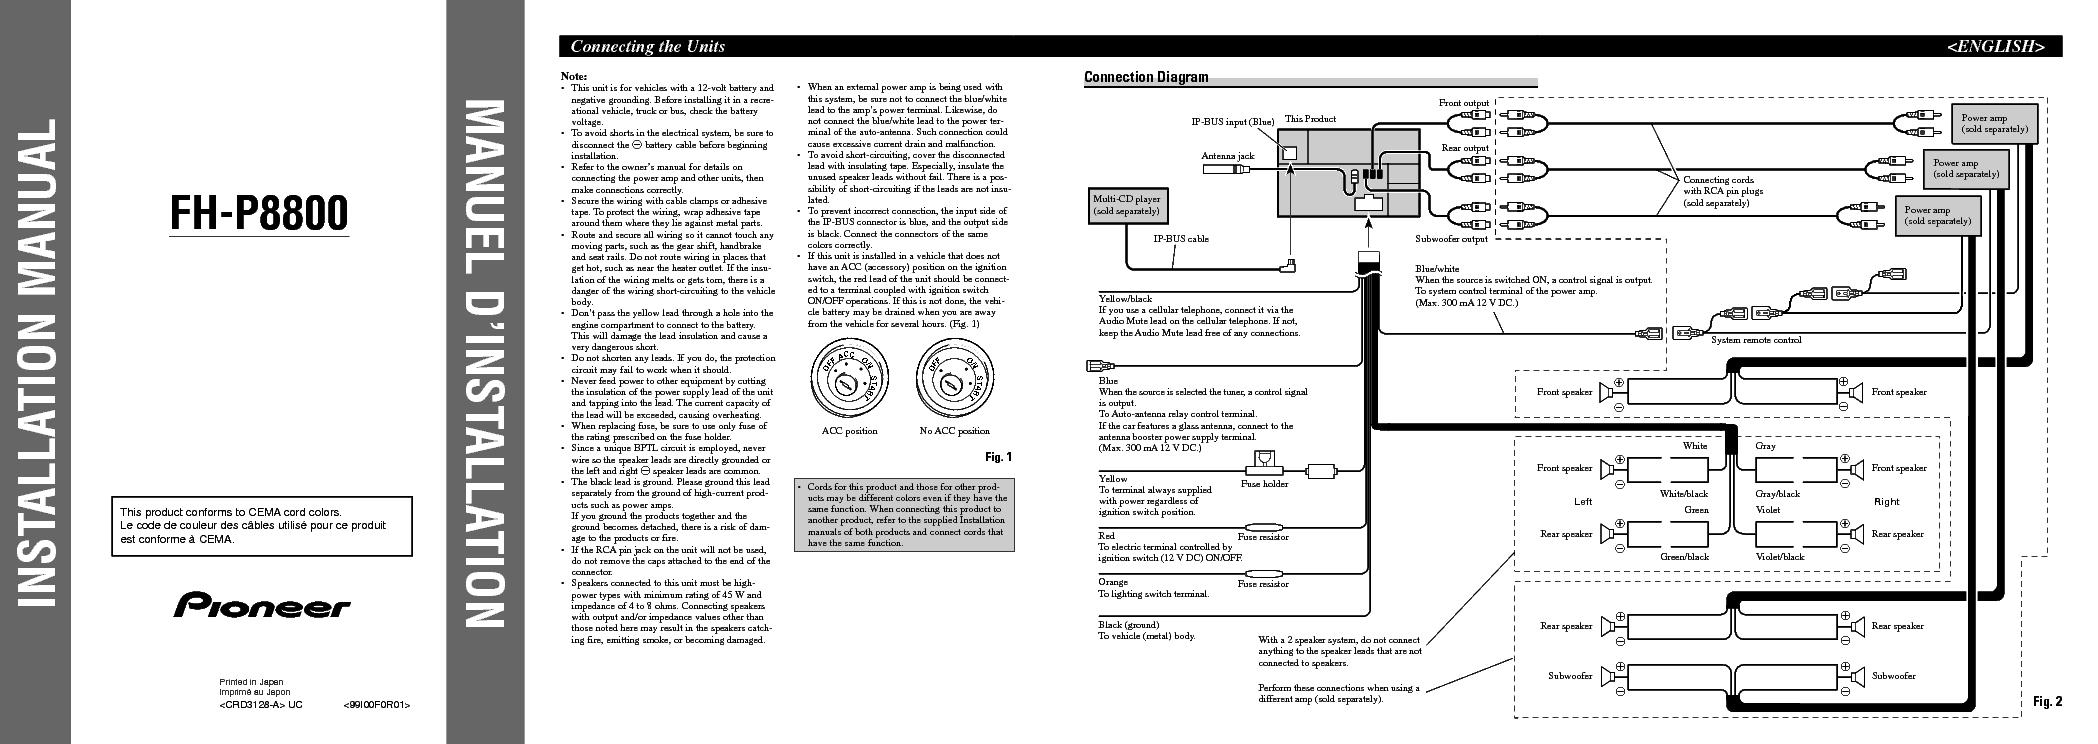 pioneer fh x700bt wiring diagram pdf